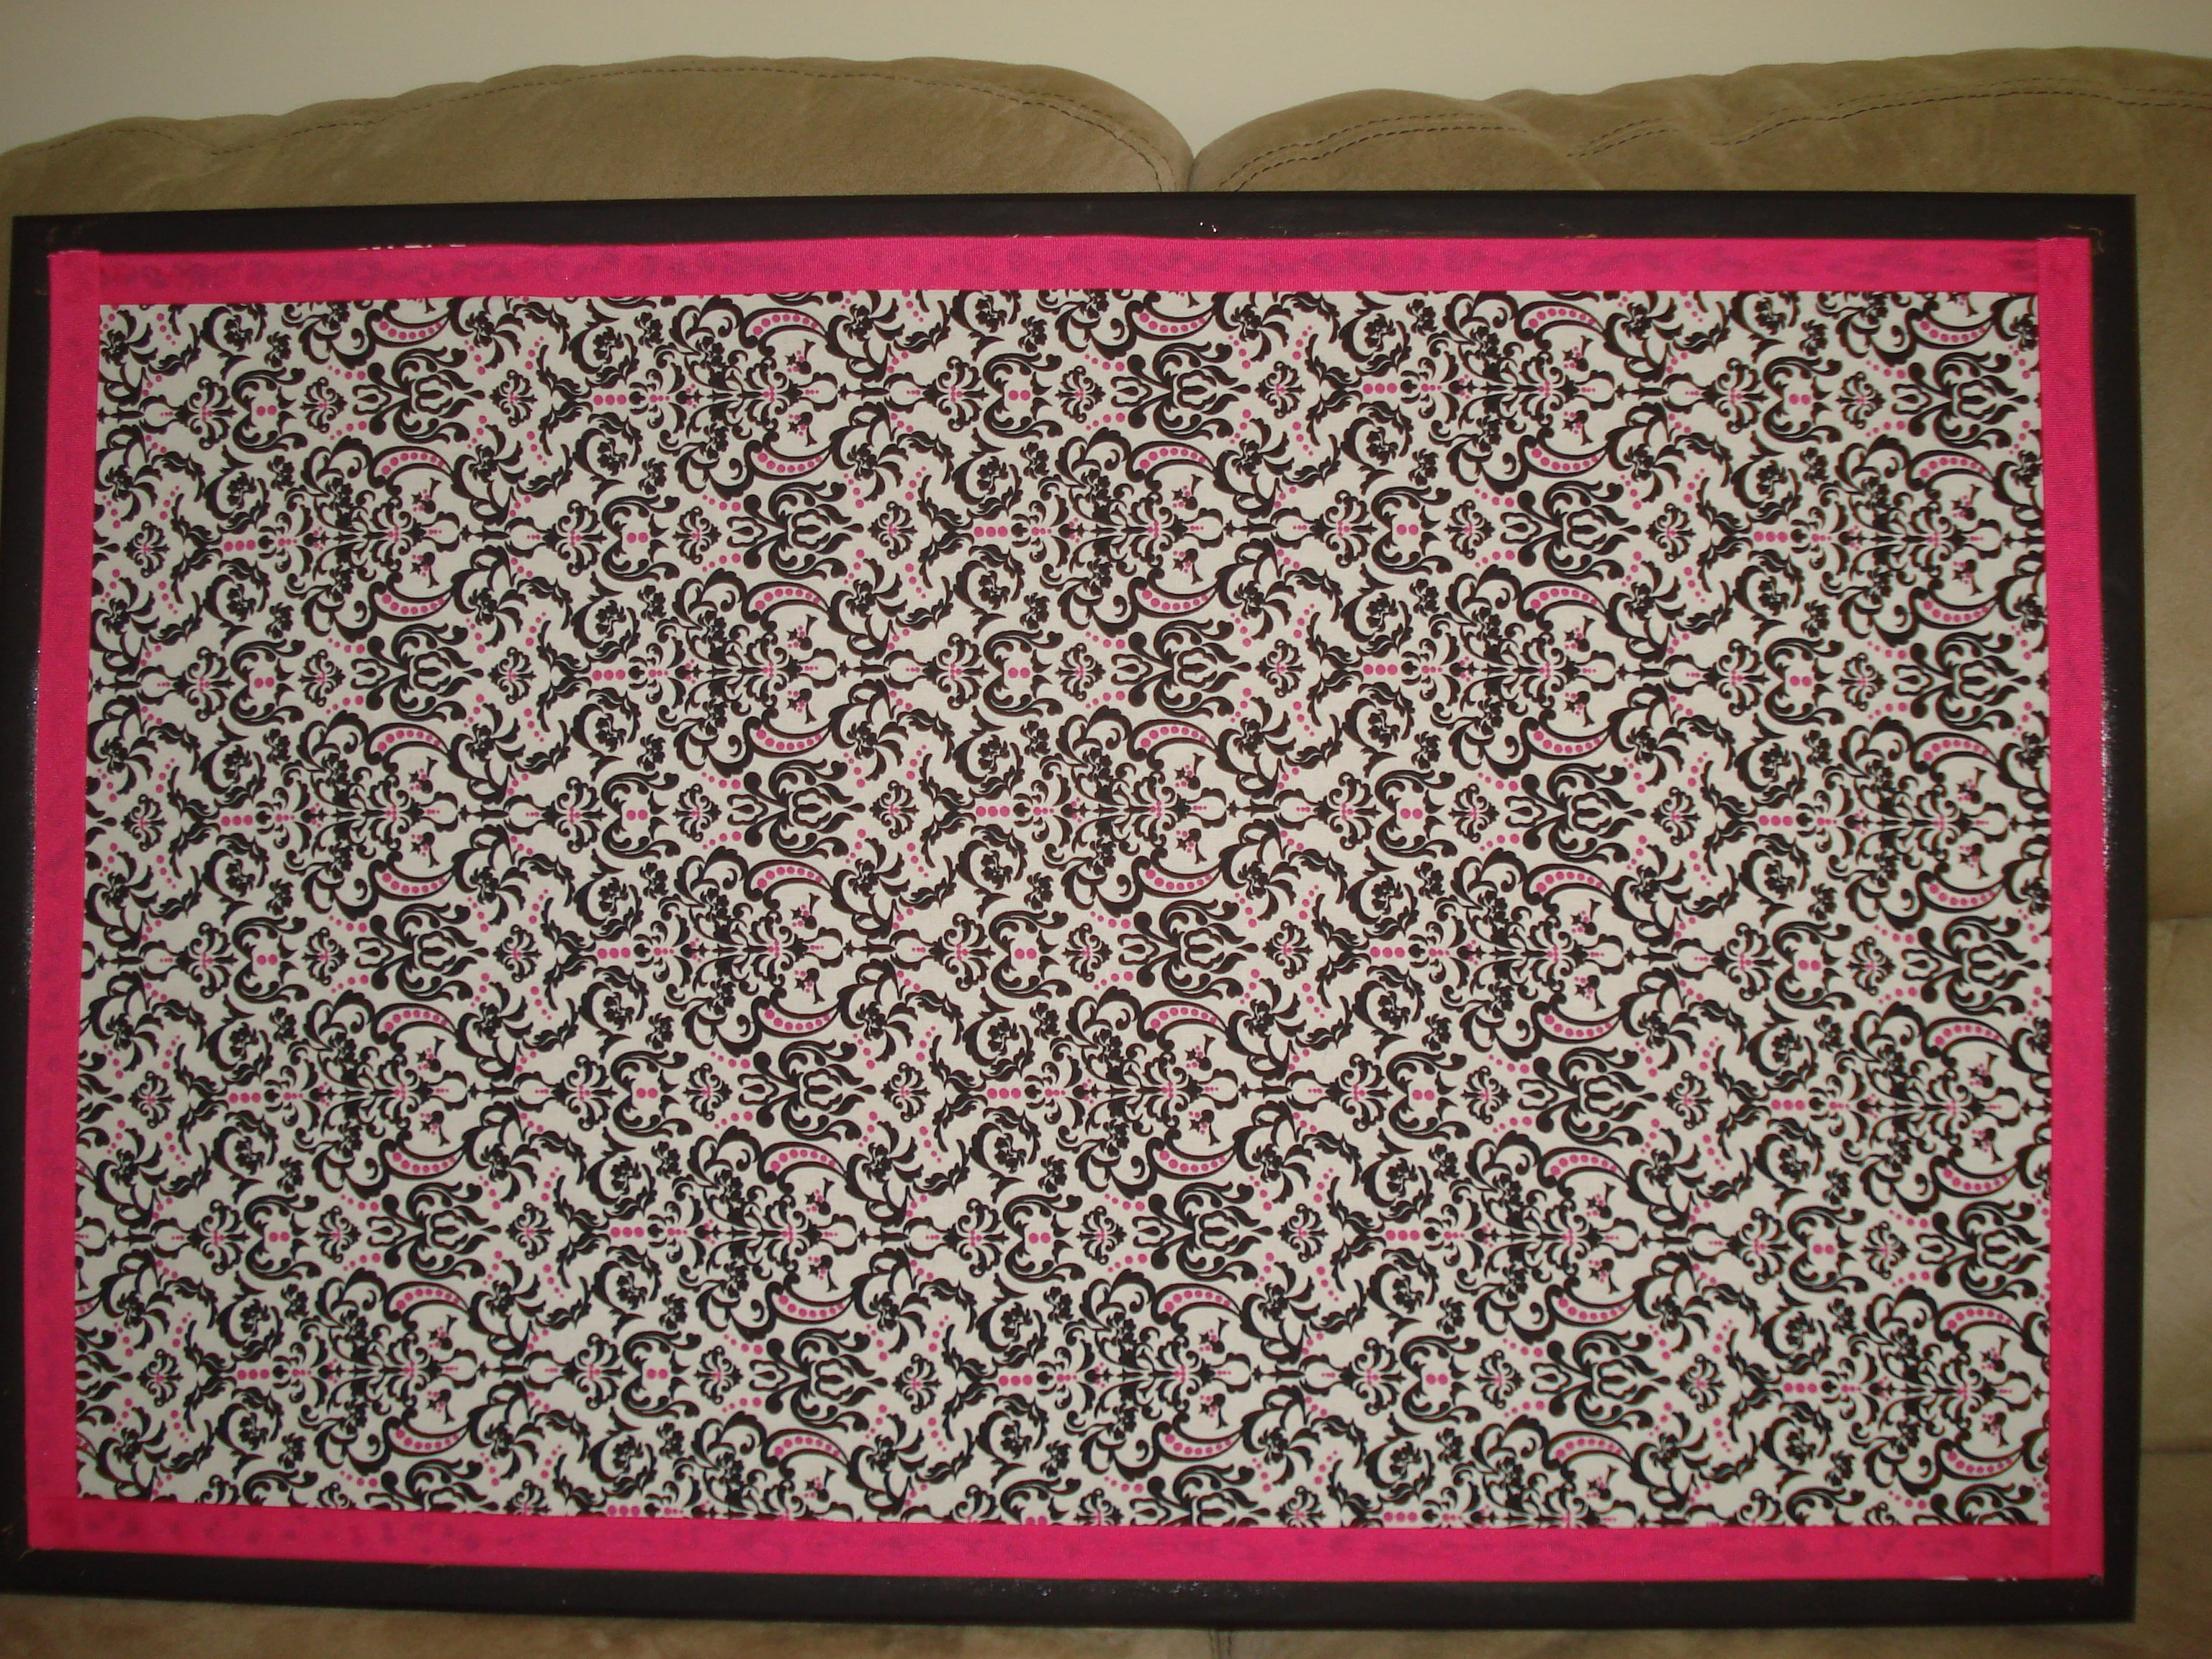 Crafty idea create your own fabric covered bulletin board for Cork board ideas